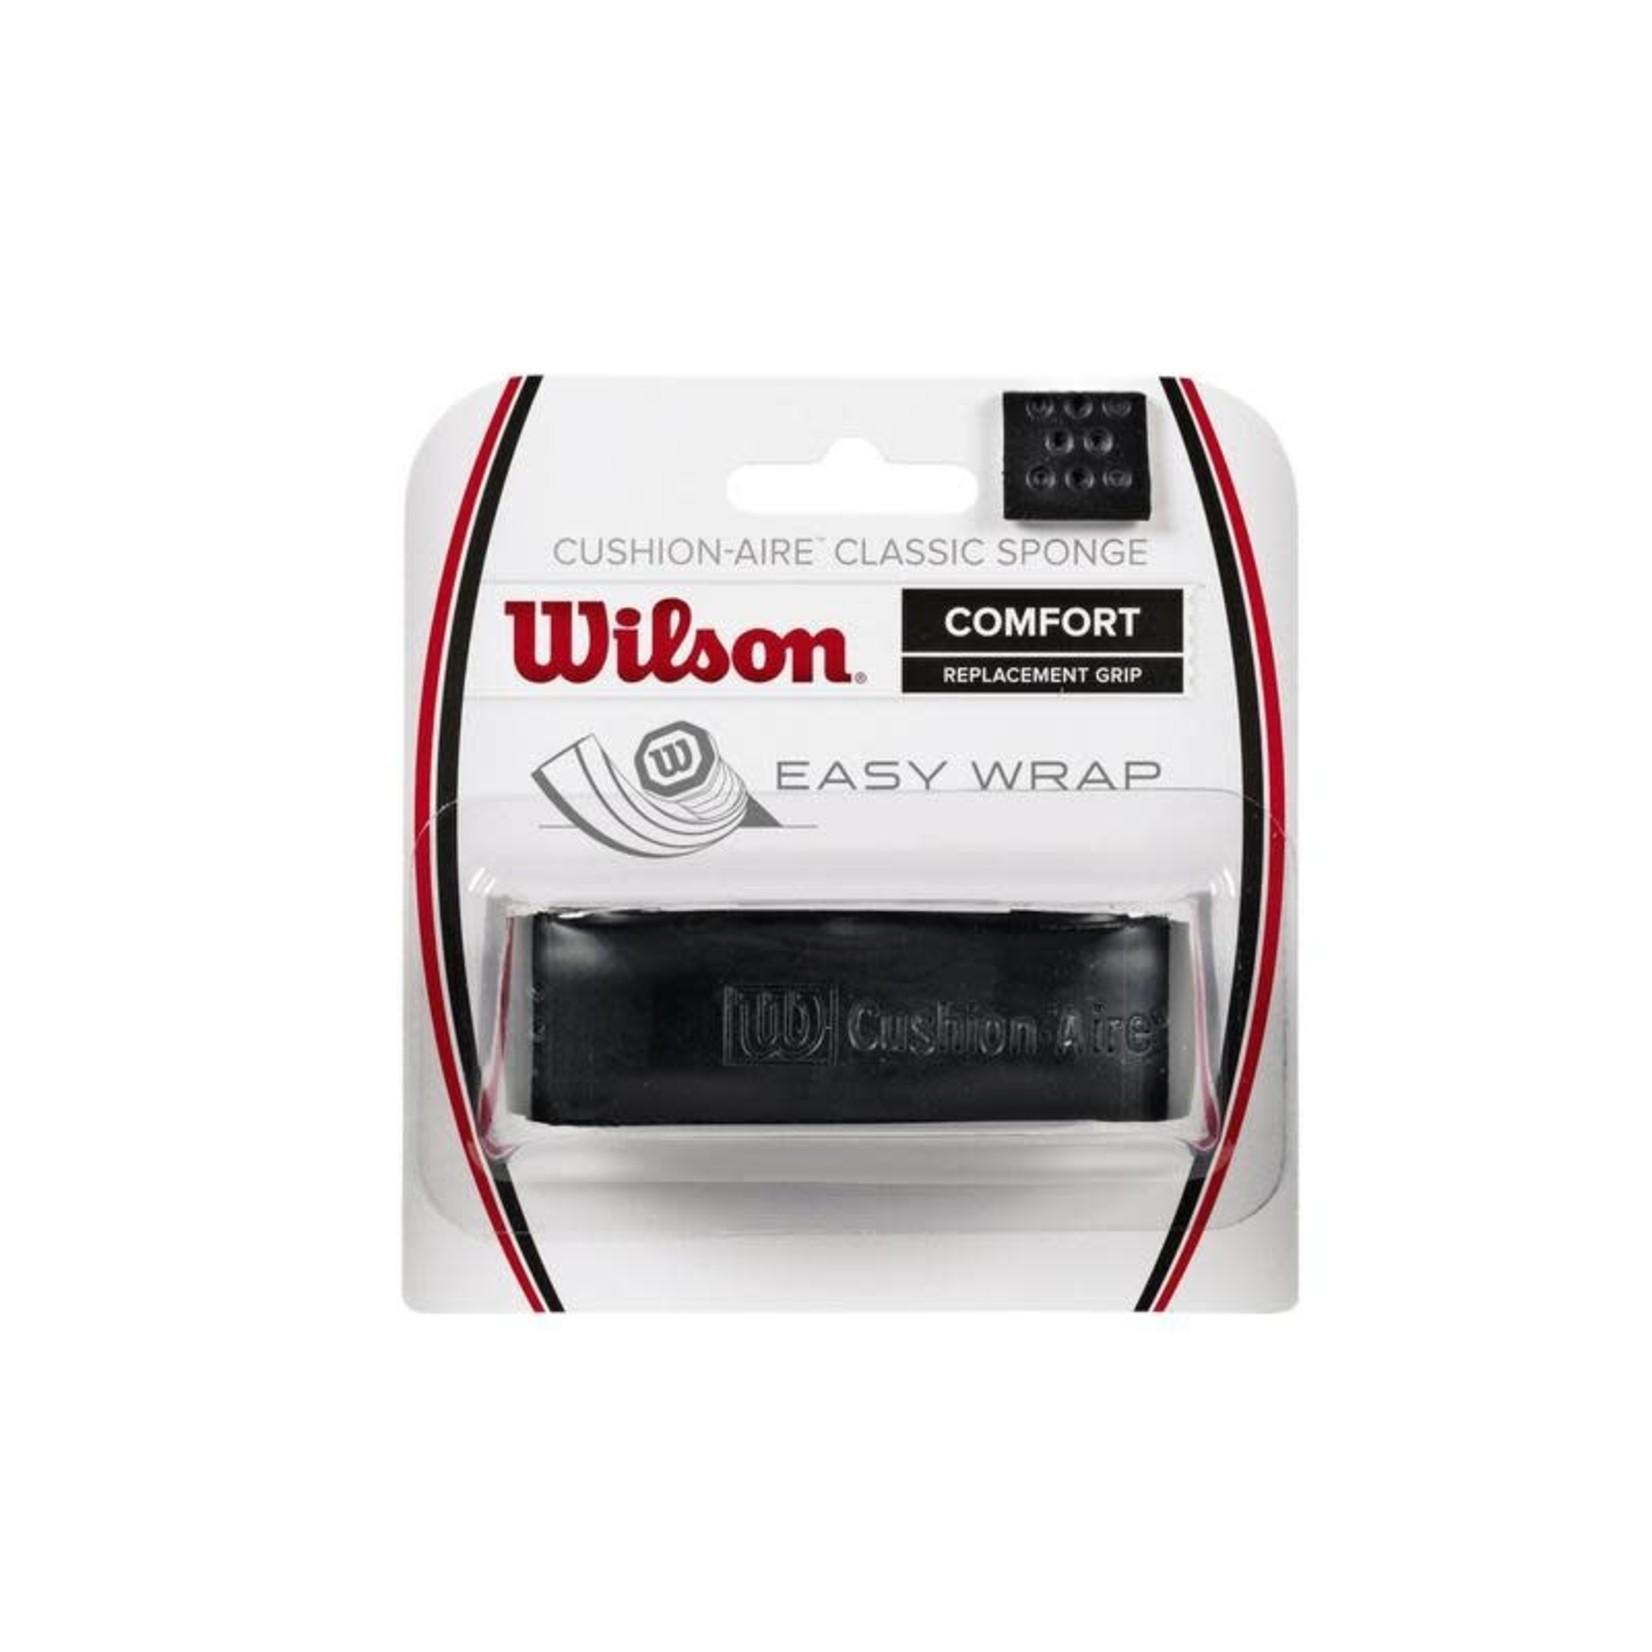 Wilson Cushion-Aire Classic Sponge Replacement Grip Zwart